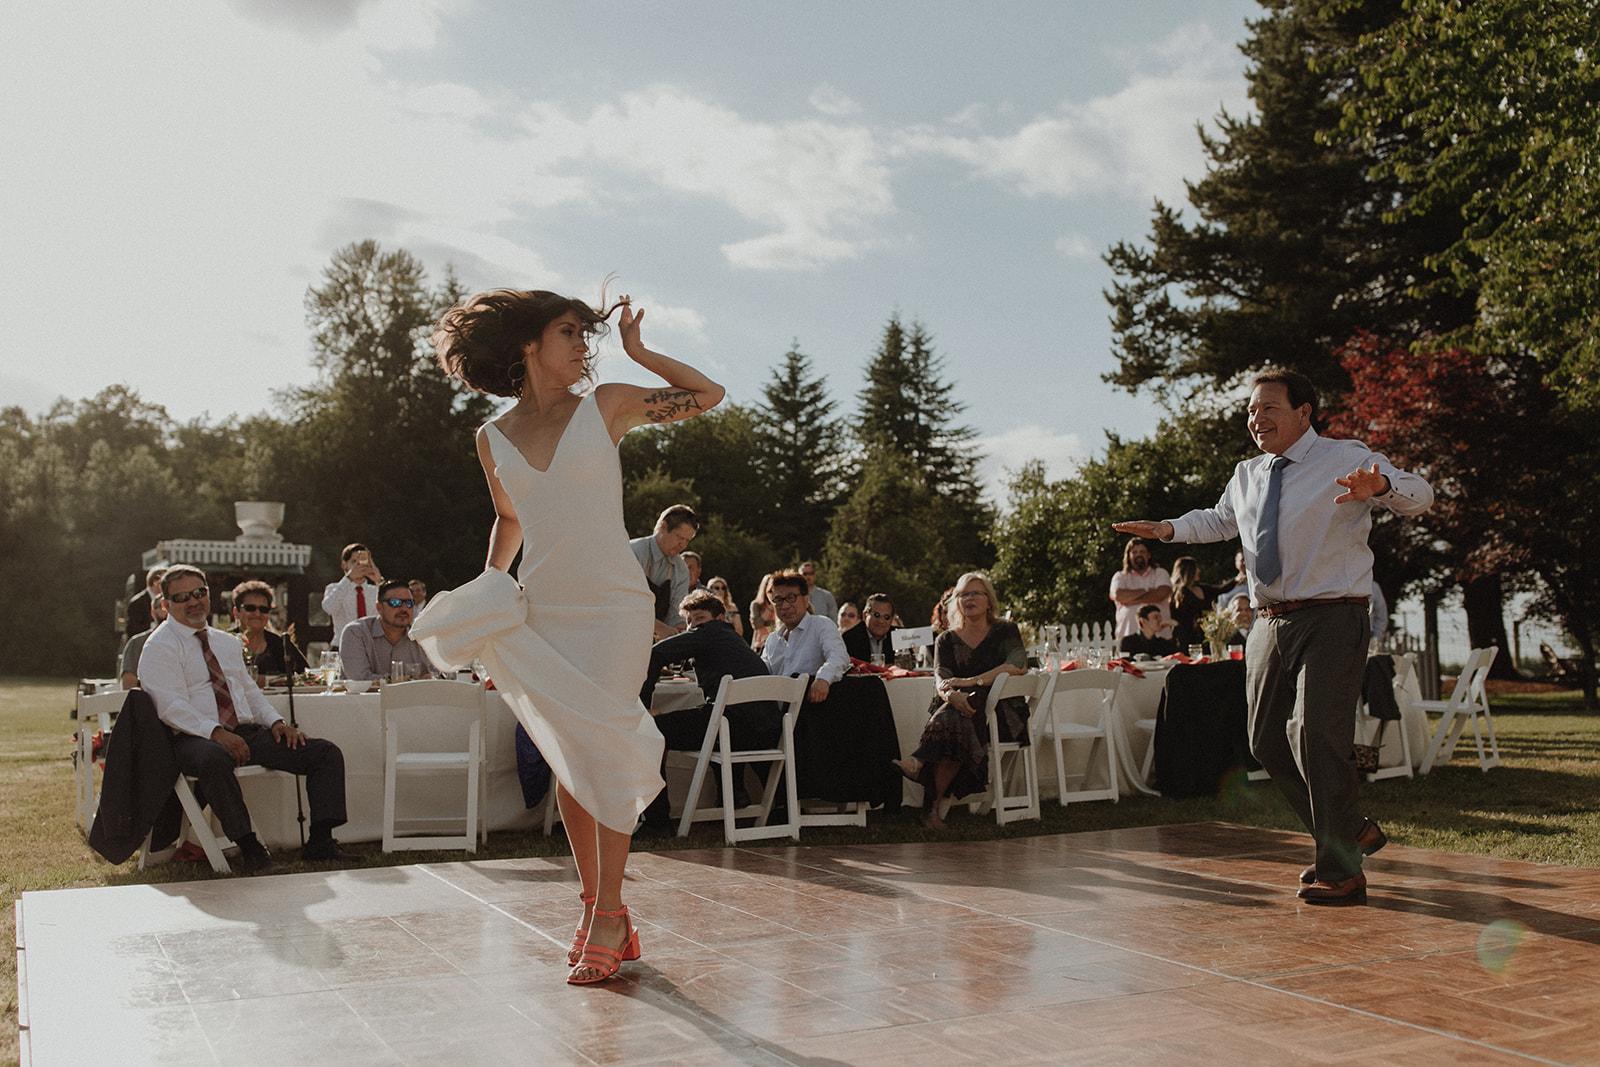 cortney_skye_wedding_june2019-627.jpg